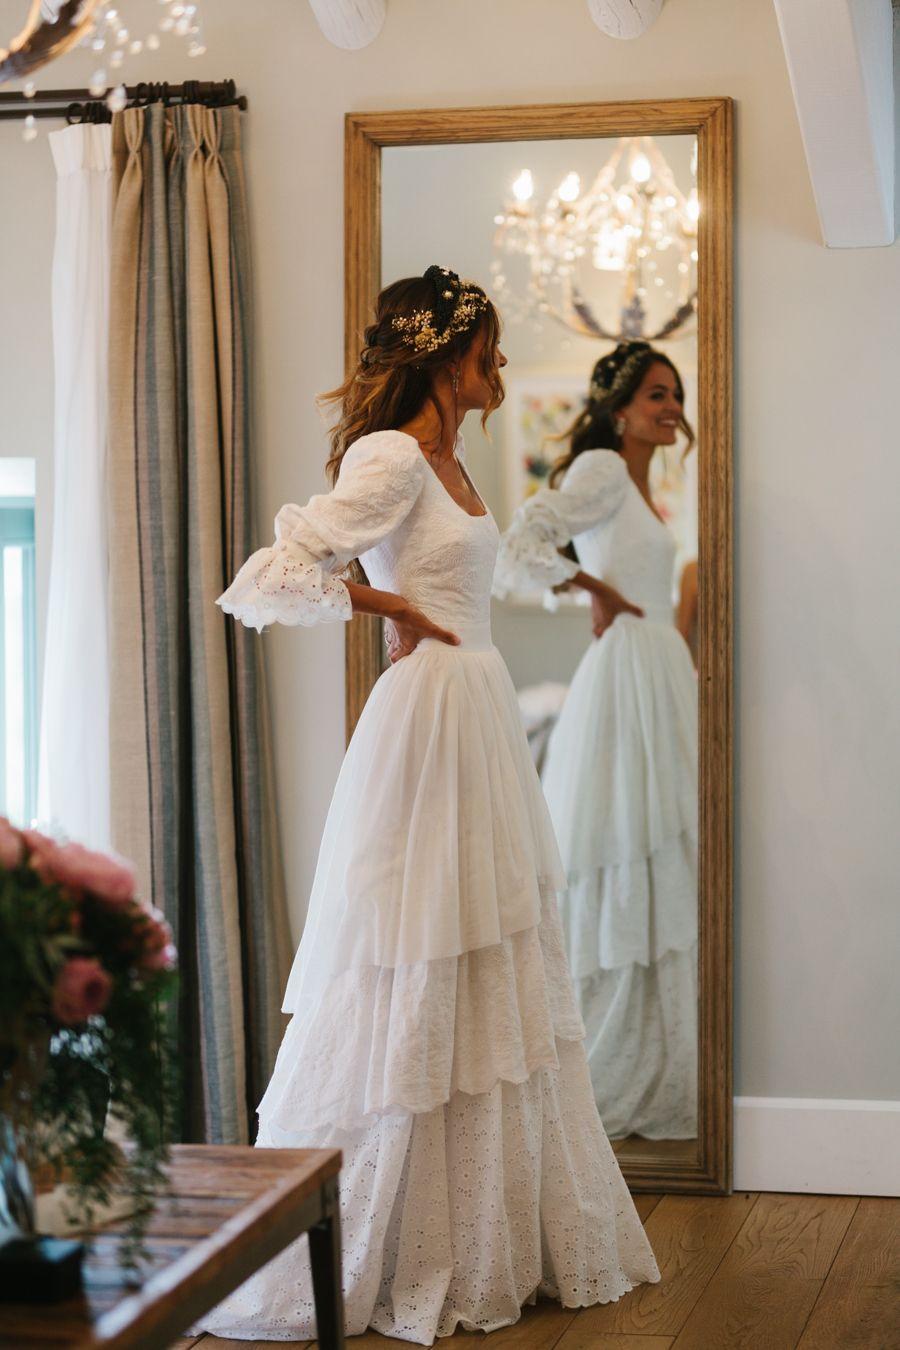 Pin by ⚽Lea⚽ on Wedding  Wedding dress trends, Wedding dresses